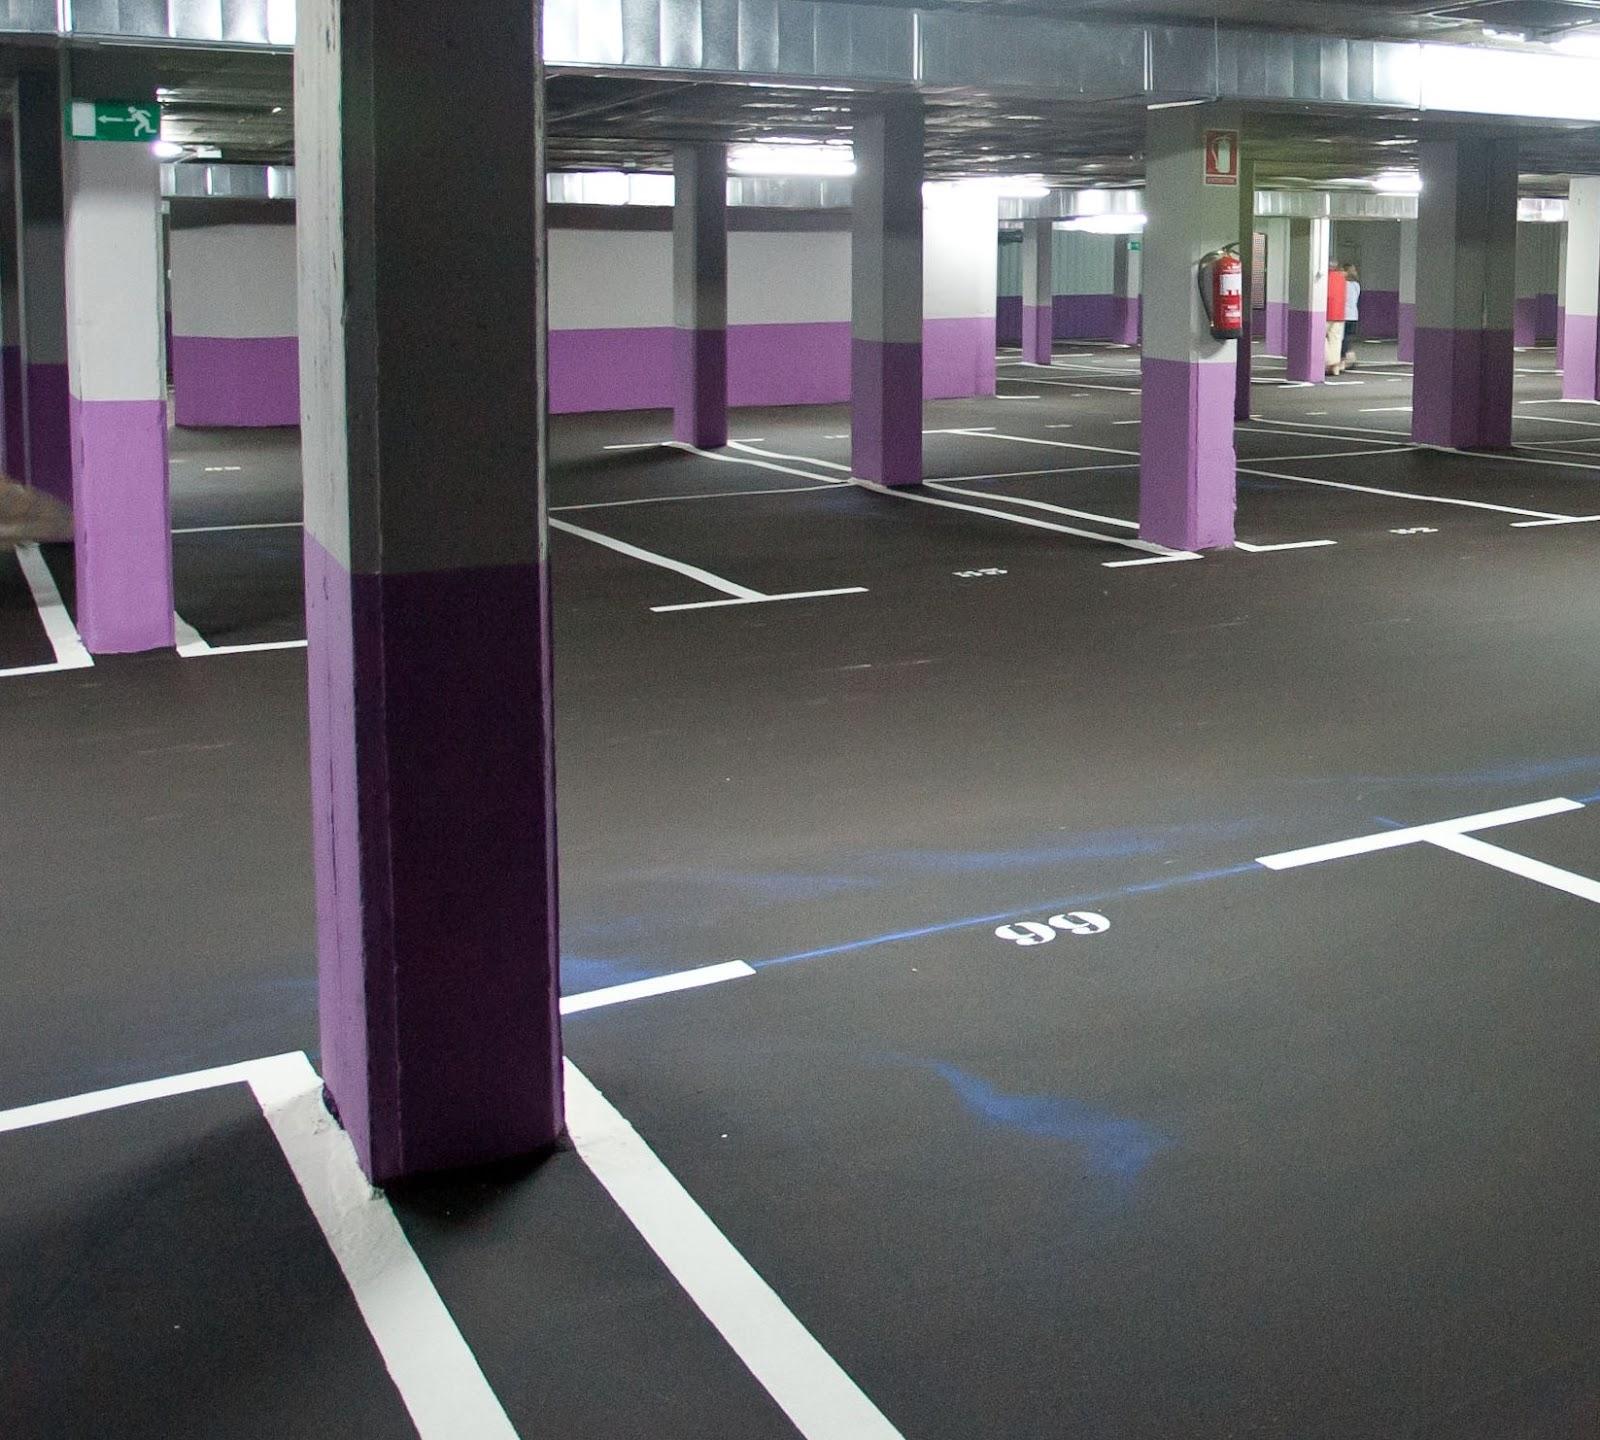 Elperi dicodegetafe otro mes de oferta para vender plazas de garaje de la emsv - Vender garaje ...